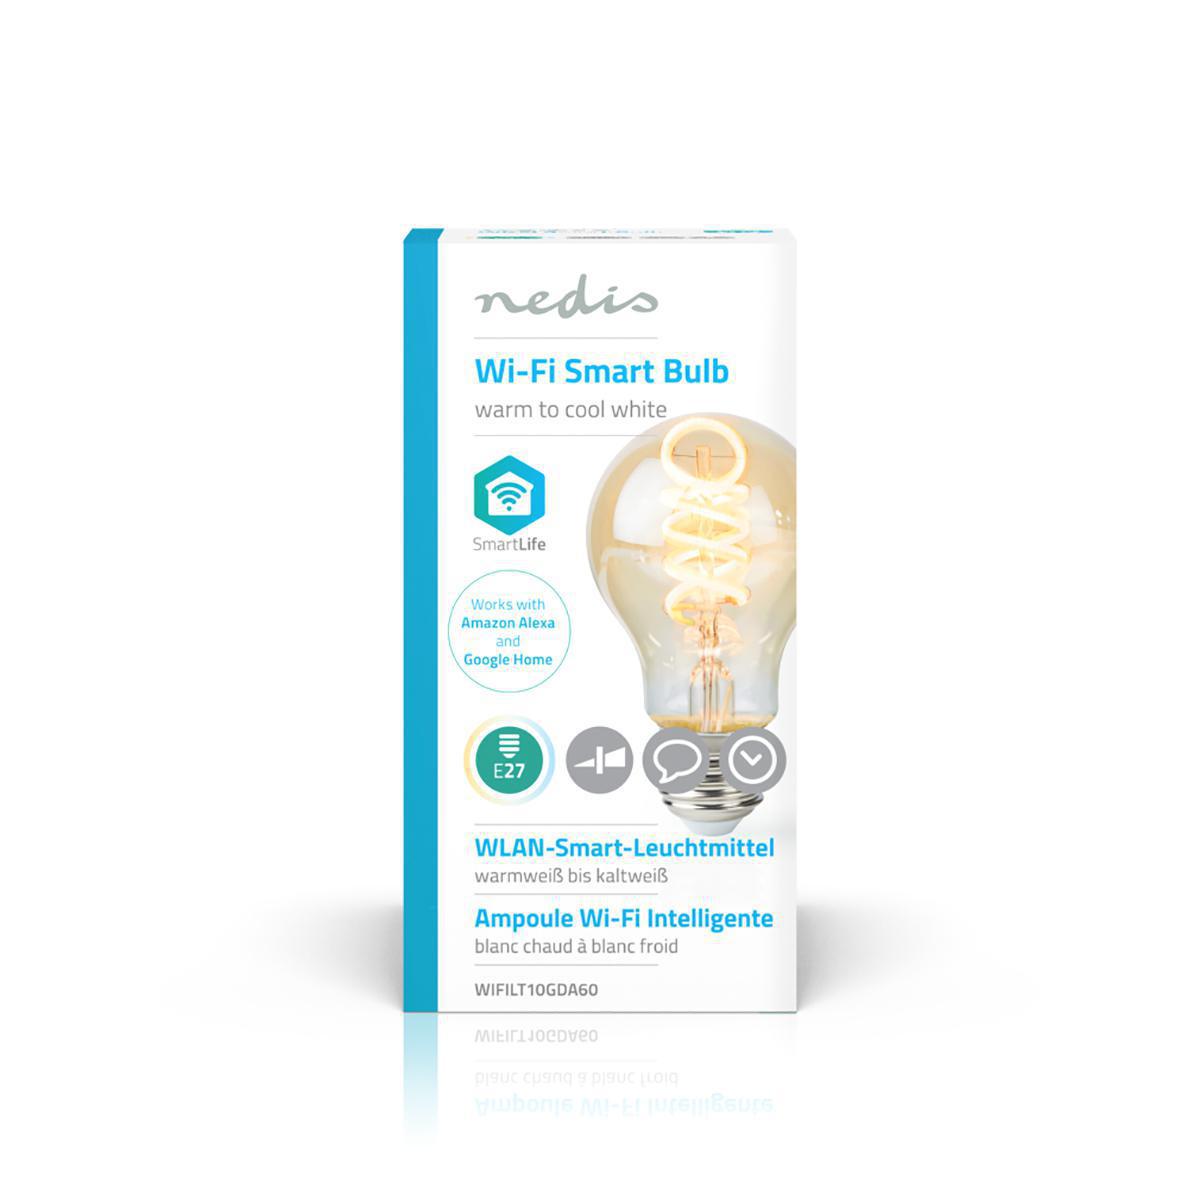 Slimme WiFi LED lamp - in kleur verstelbaar - 1800K warm wit - 6500K daglicht E27 spiraal lamp - dimbaar - app besturing - 5,5W - verpakking